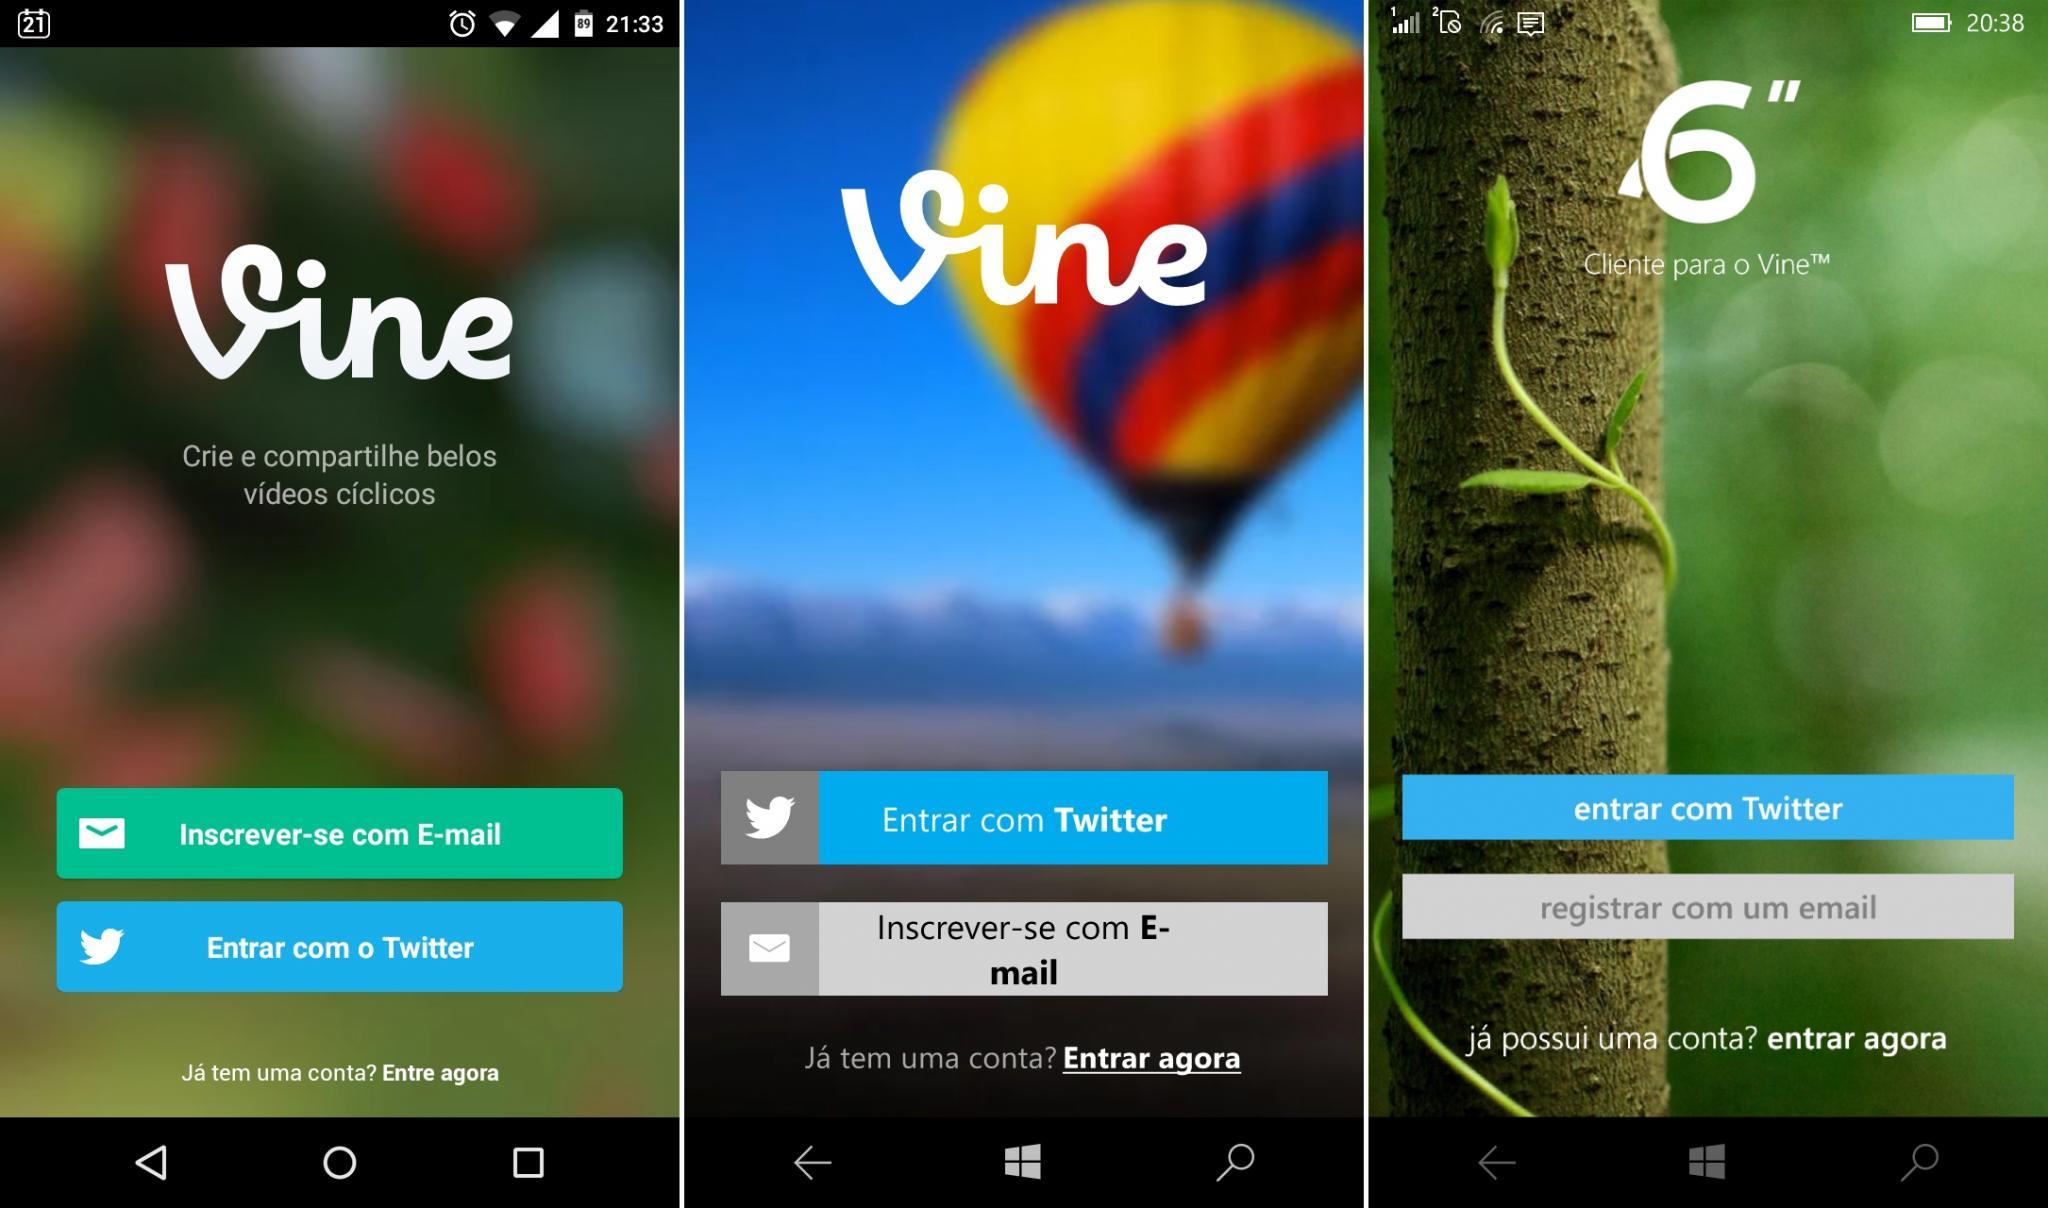 Comparativo de apps #10 - vine -1